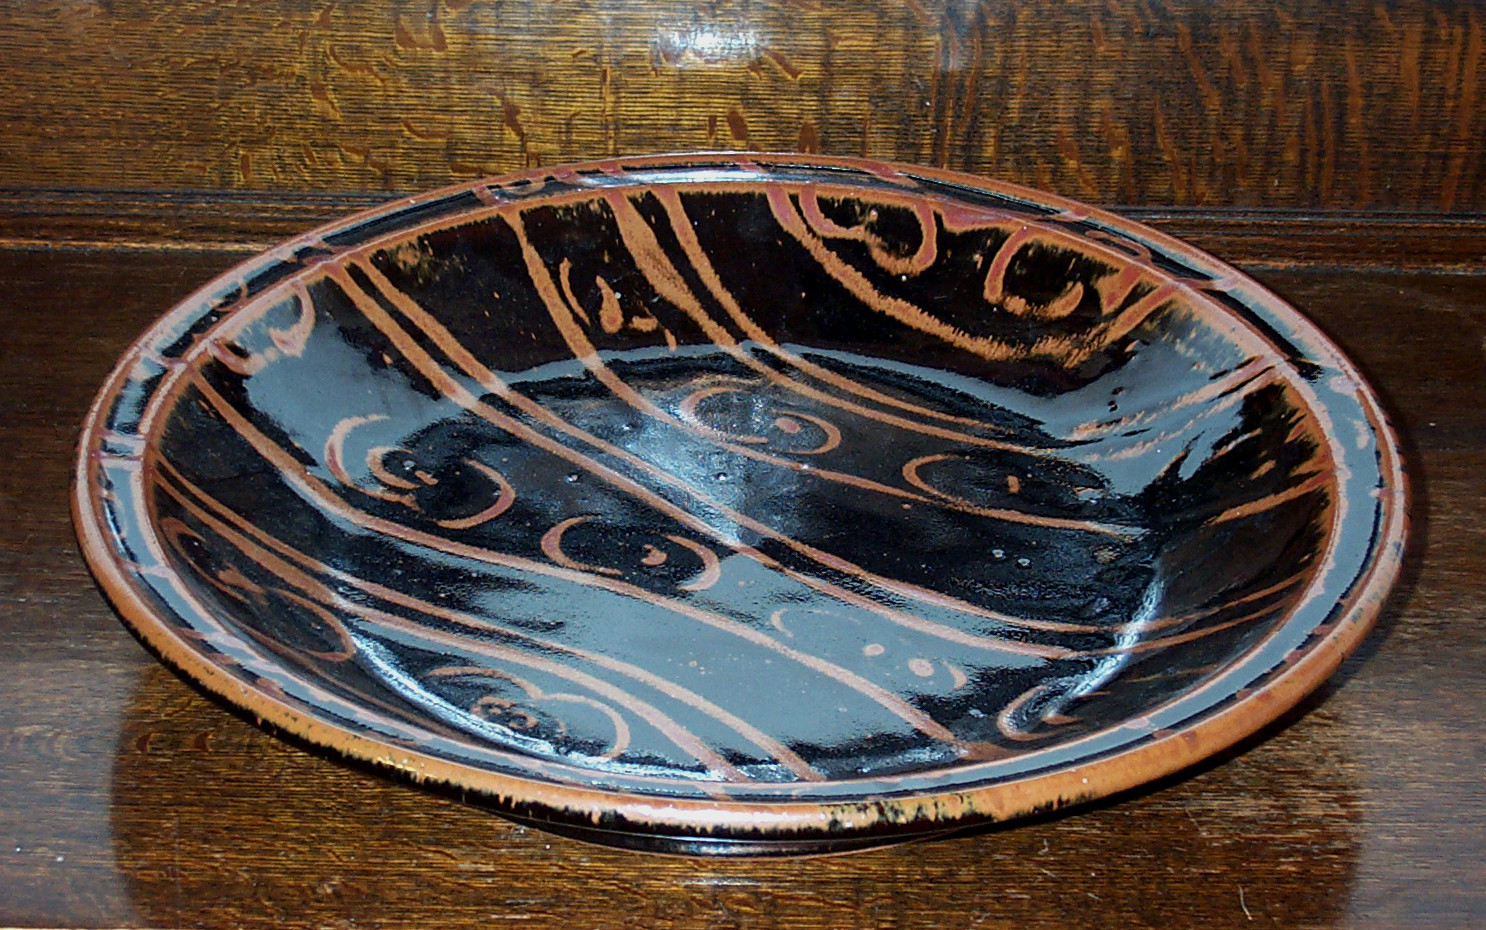 083 -Large tenmoku dish.jpg